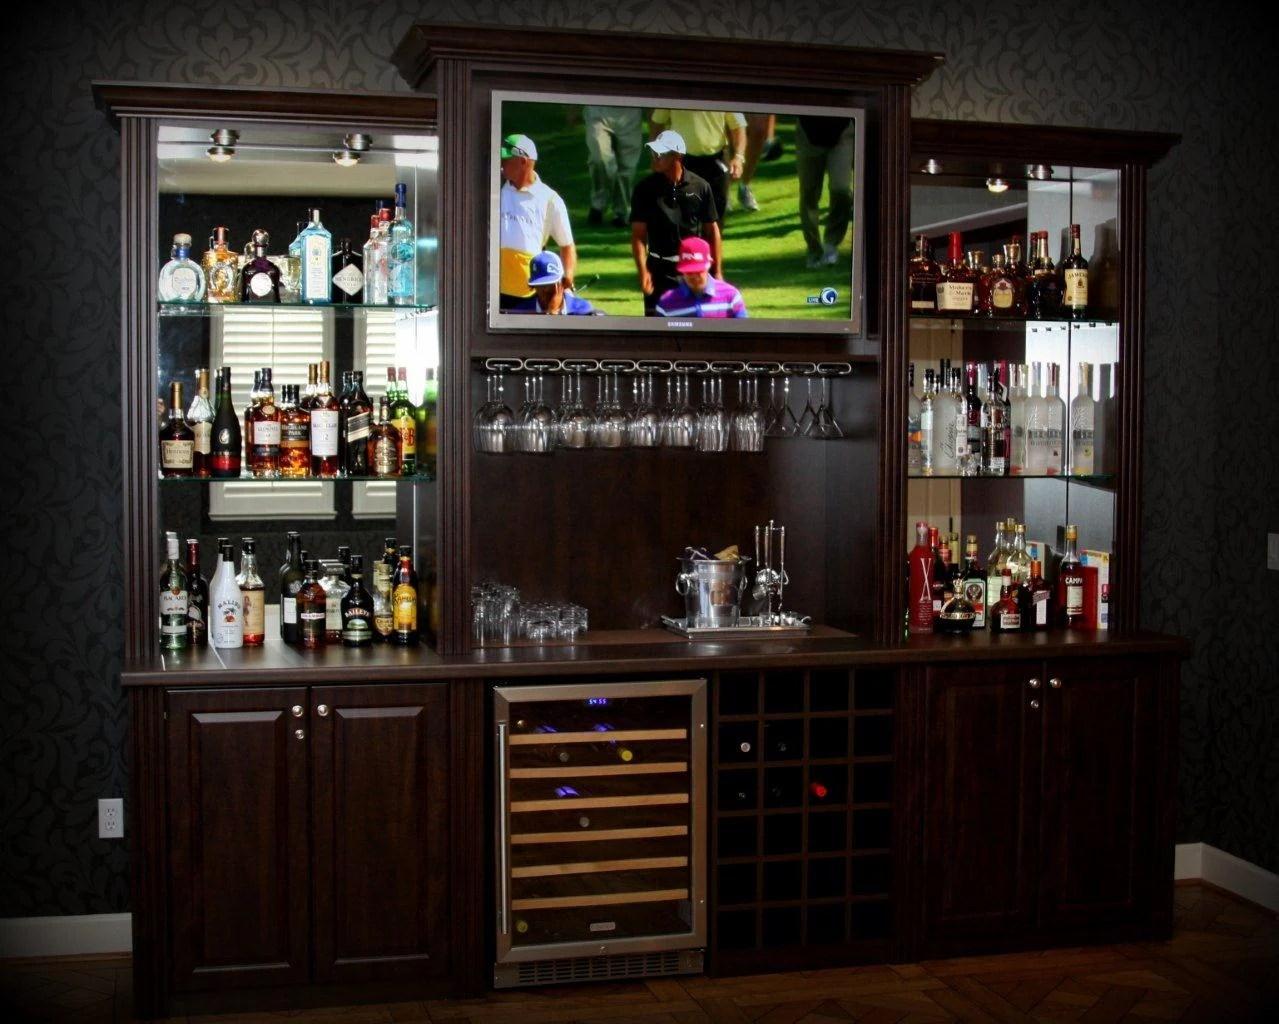 Design Bar Home Custom Ideaspowerrnges - Vtwctr on